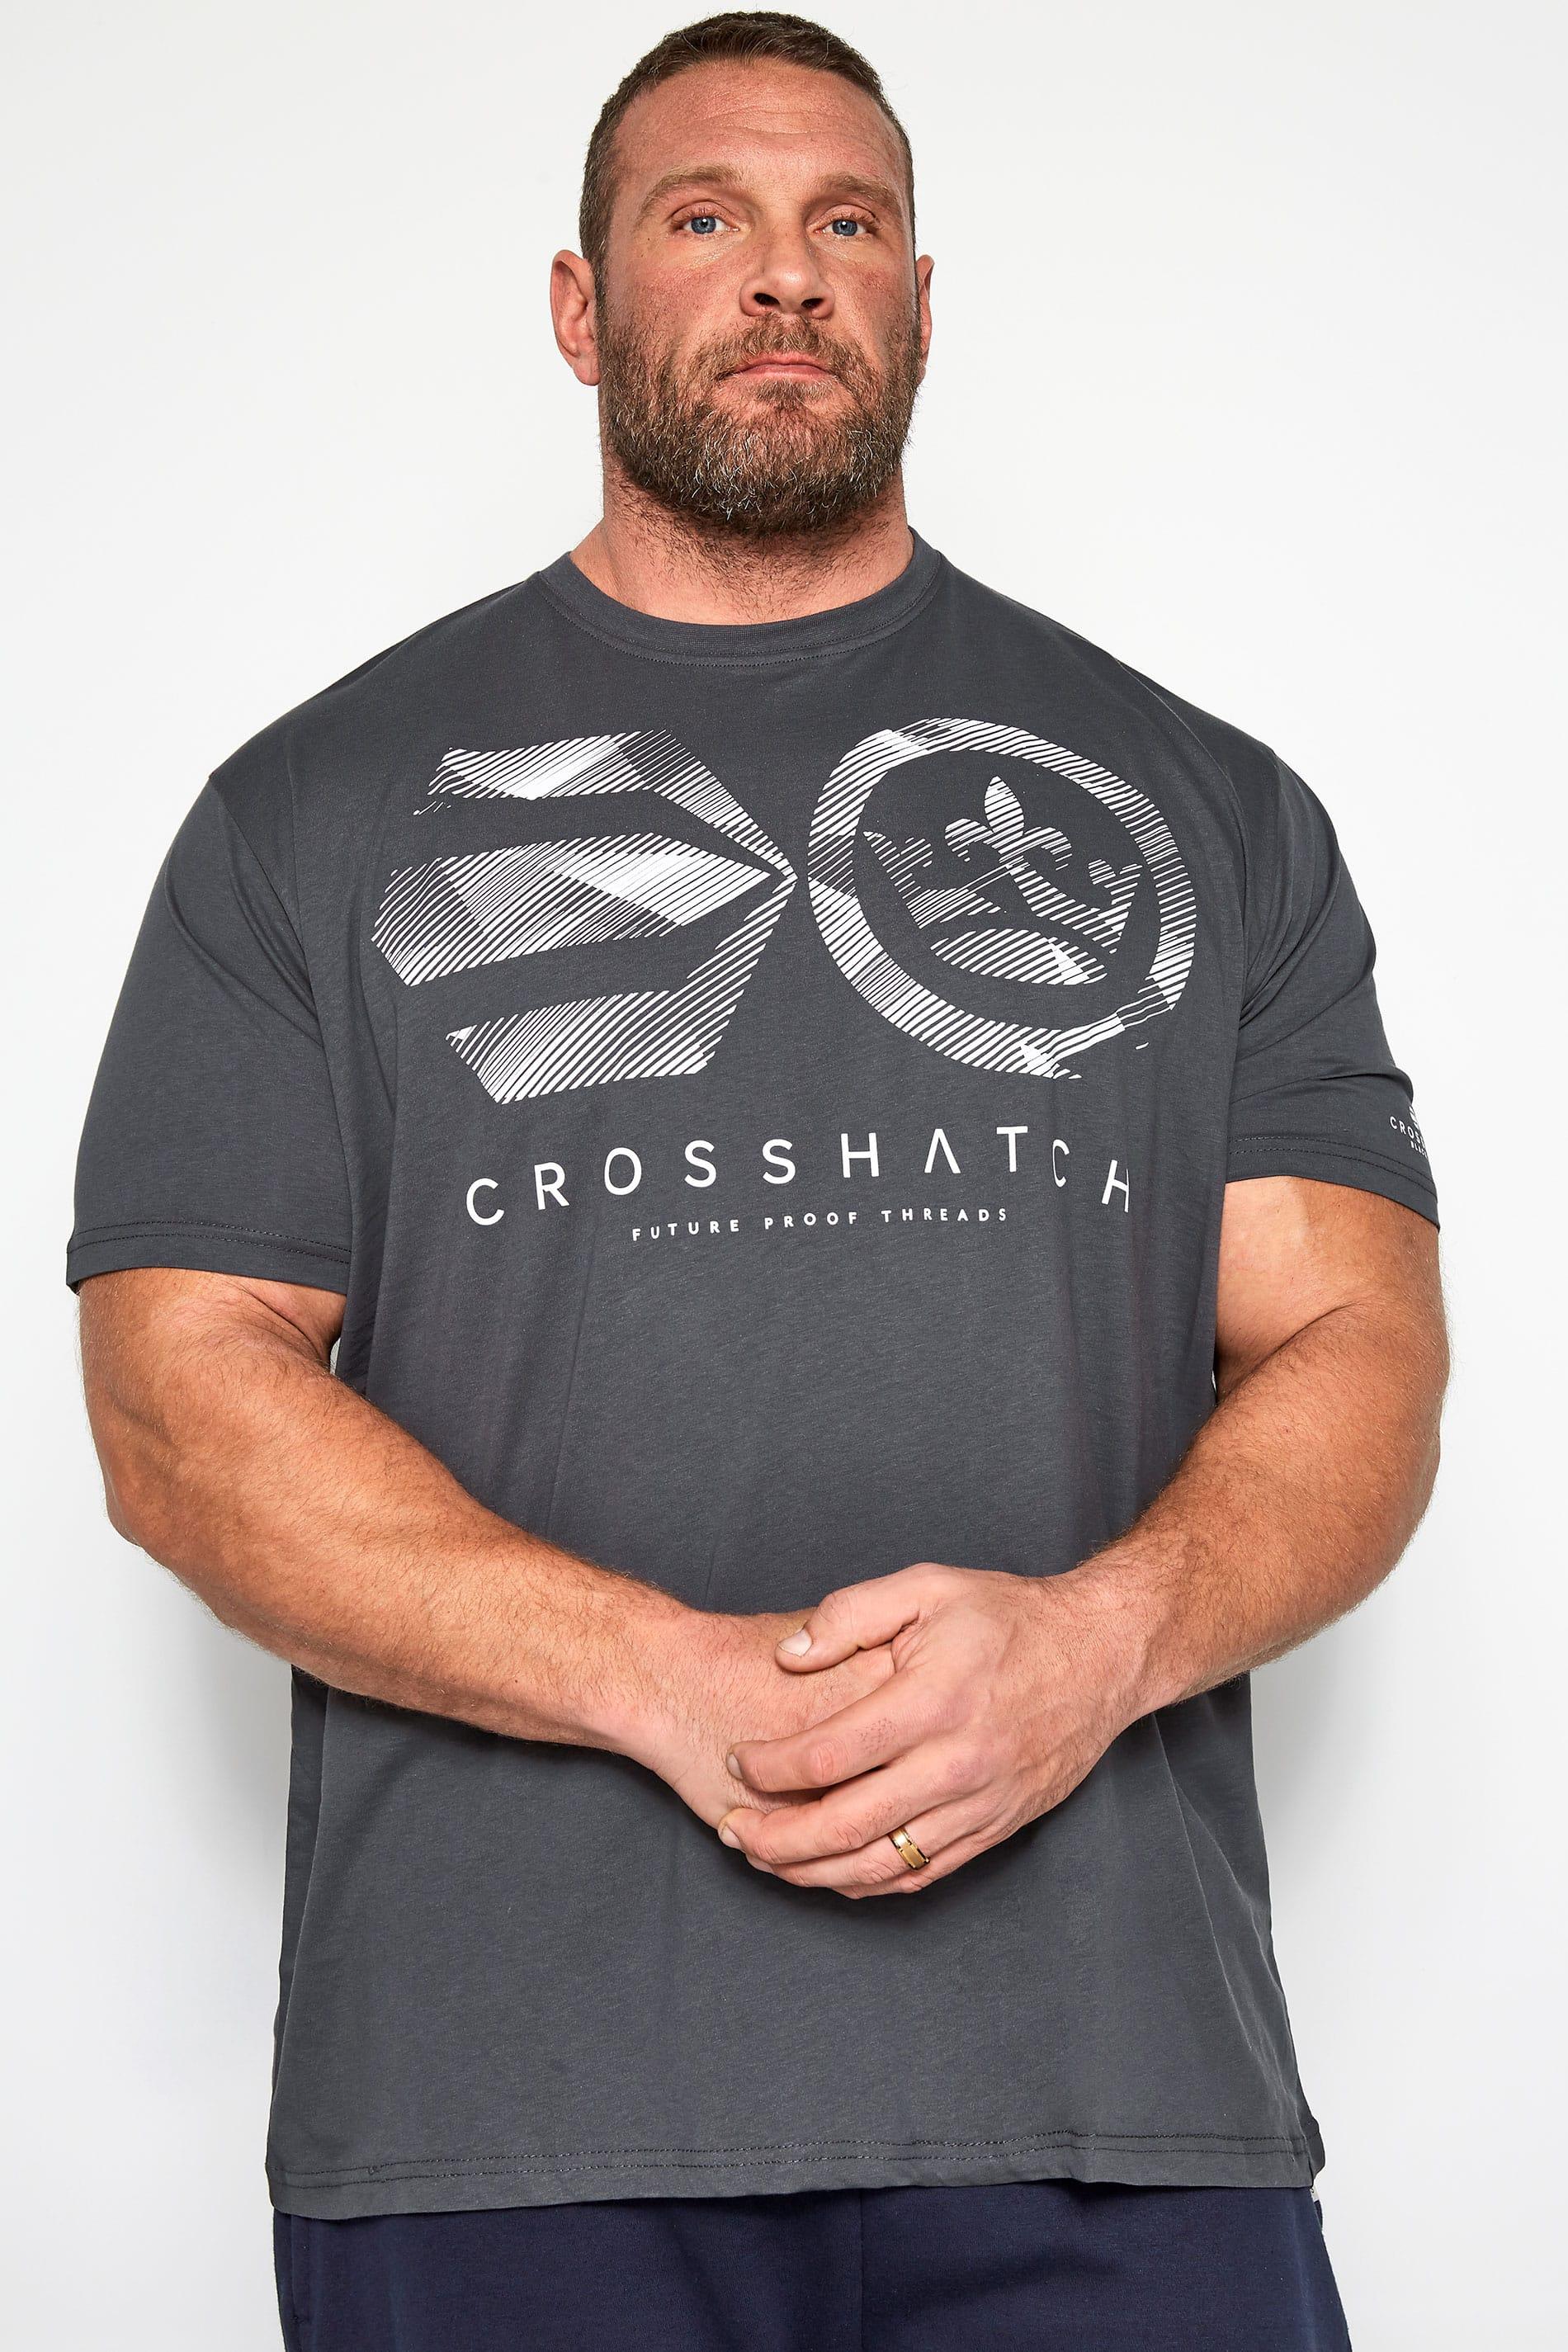 CROSSHATCH Charcoal Grey Graphic Logo Print T-Shirt